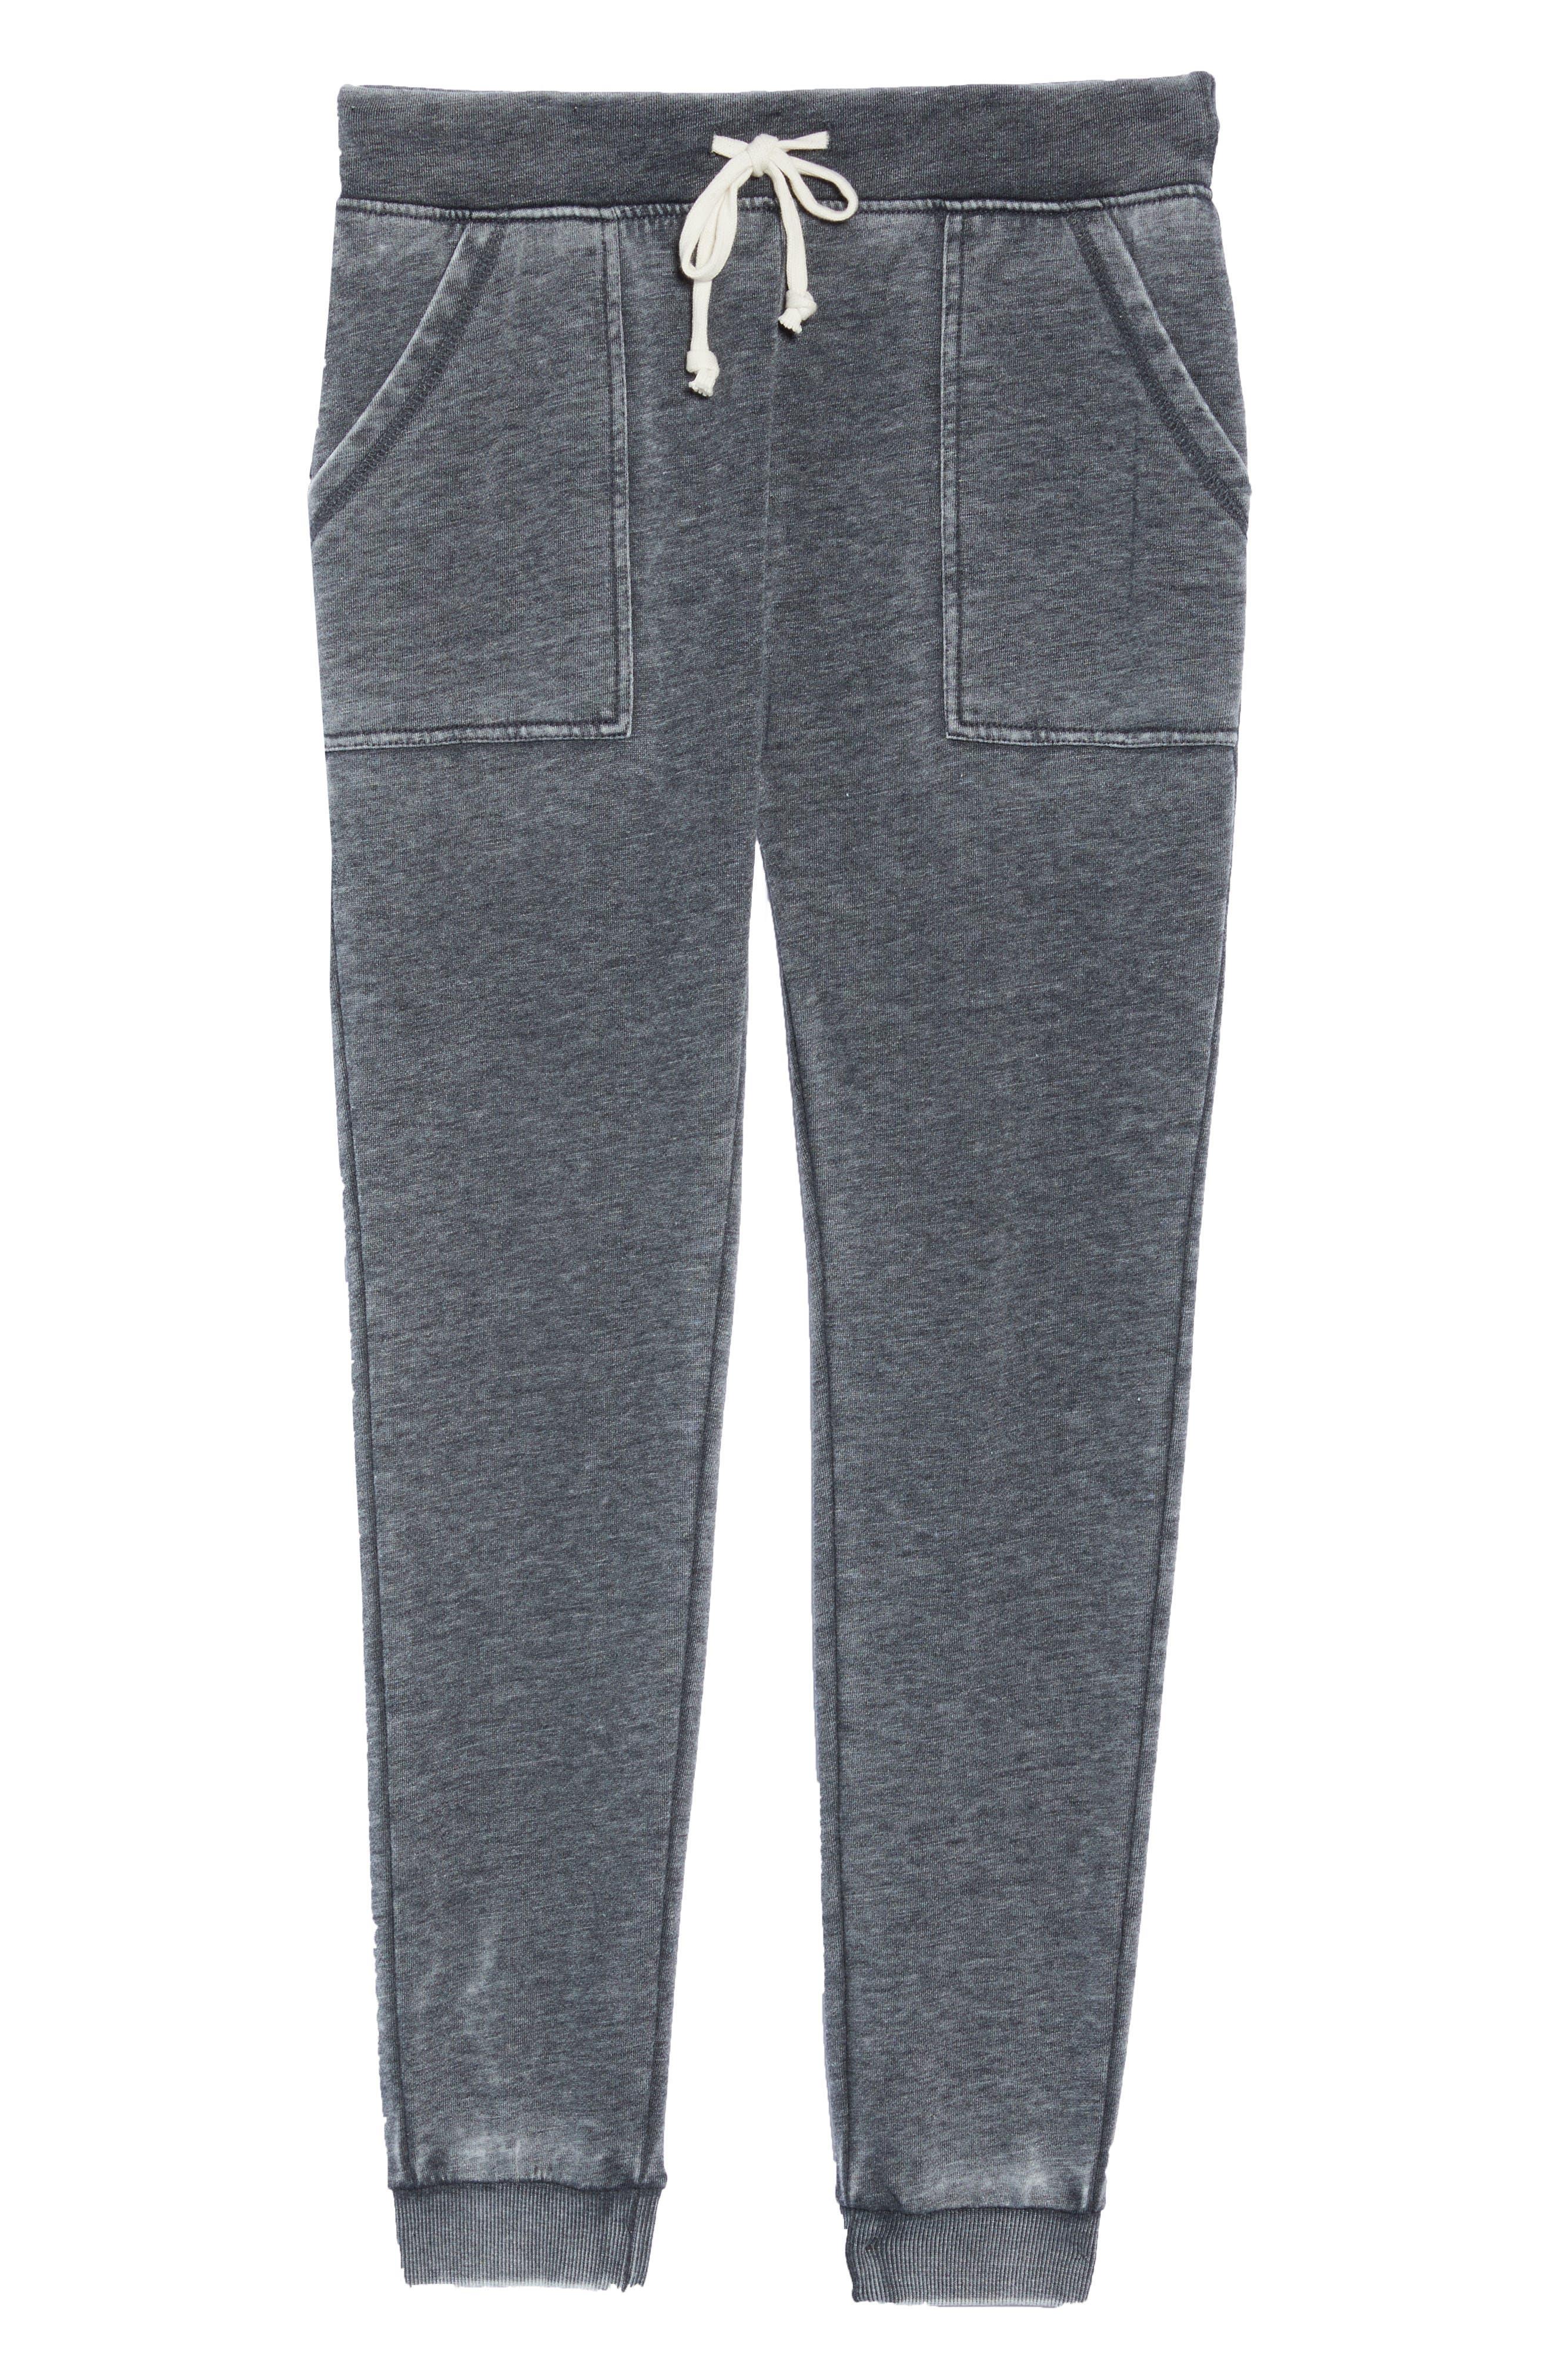 Long Weekend Pants,                             Alternate thumbnail 4, color,                             Washed Black